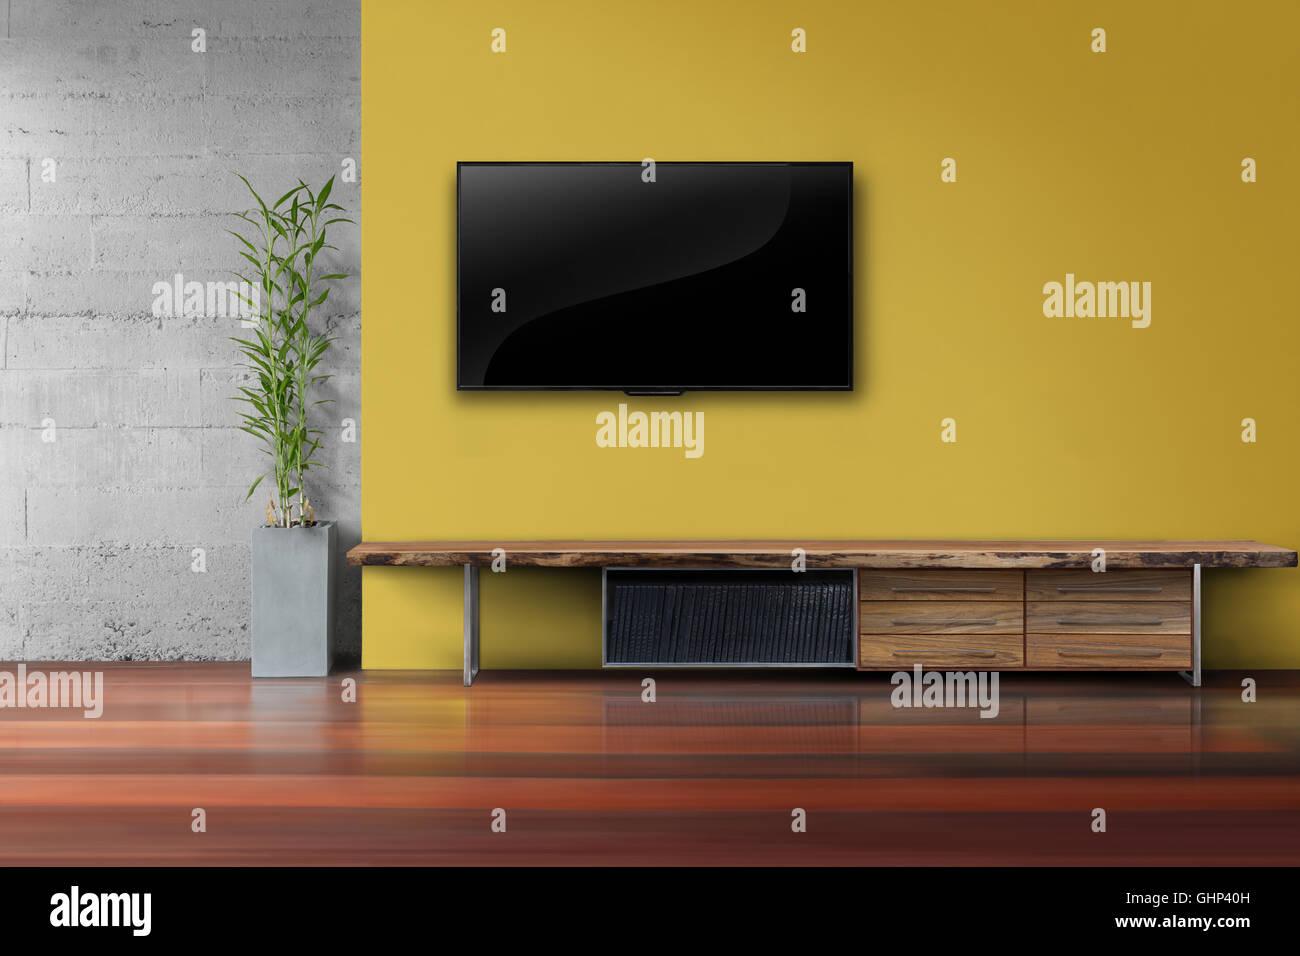 Vasos Para Sala De Tv Vasos Para Sala De Tv With Vasos Para Sala De  -> Vasos Na Sala De Tv